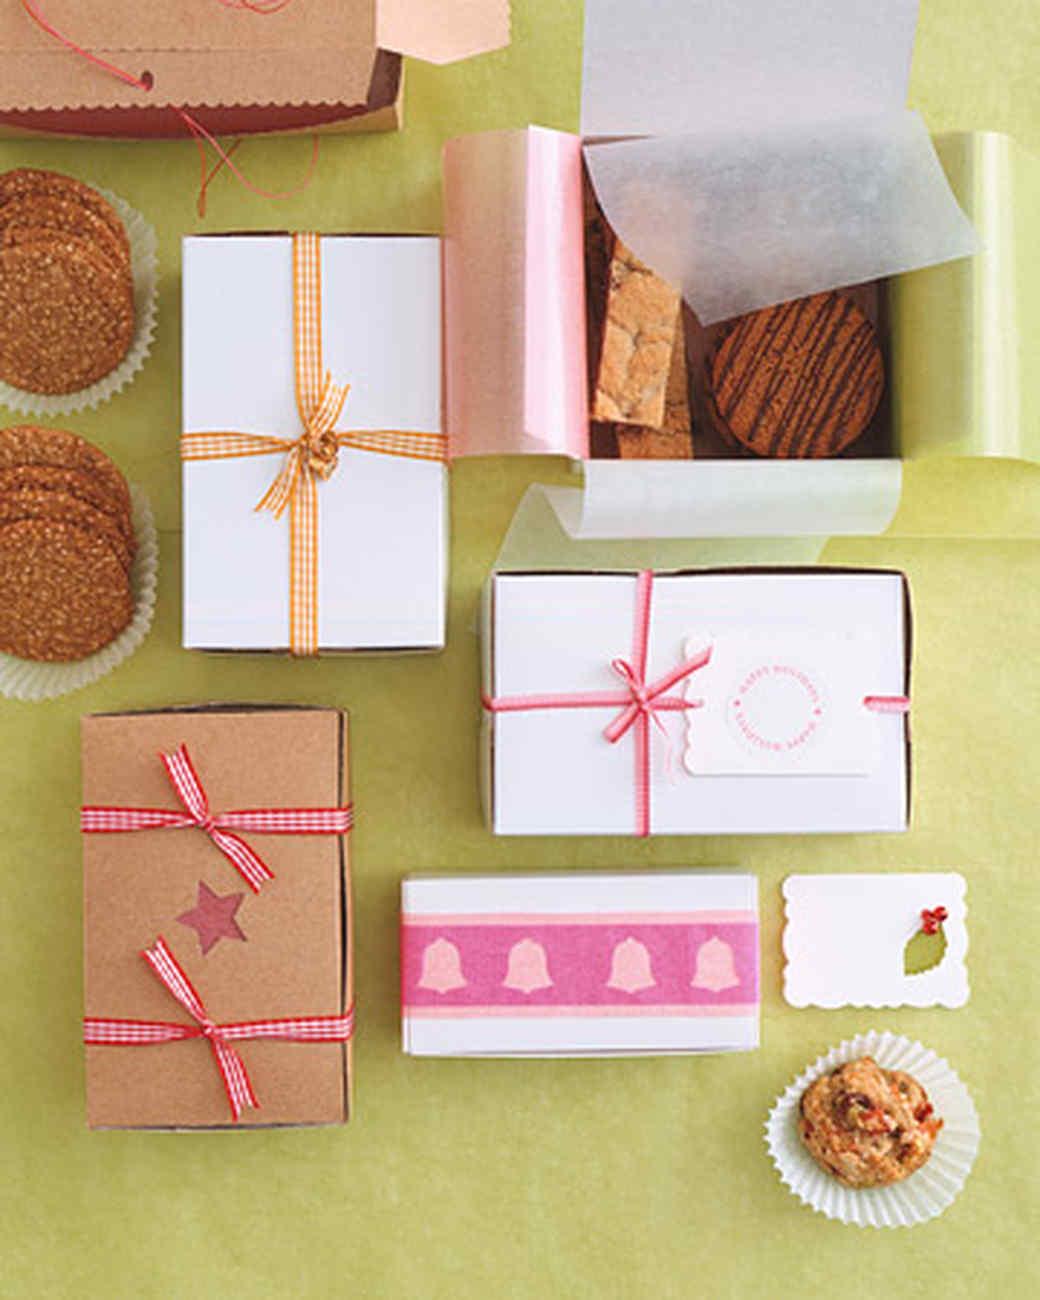 8 Steps To Hosting A Cookie Swap Martha Stewart